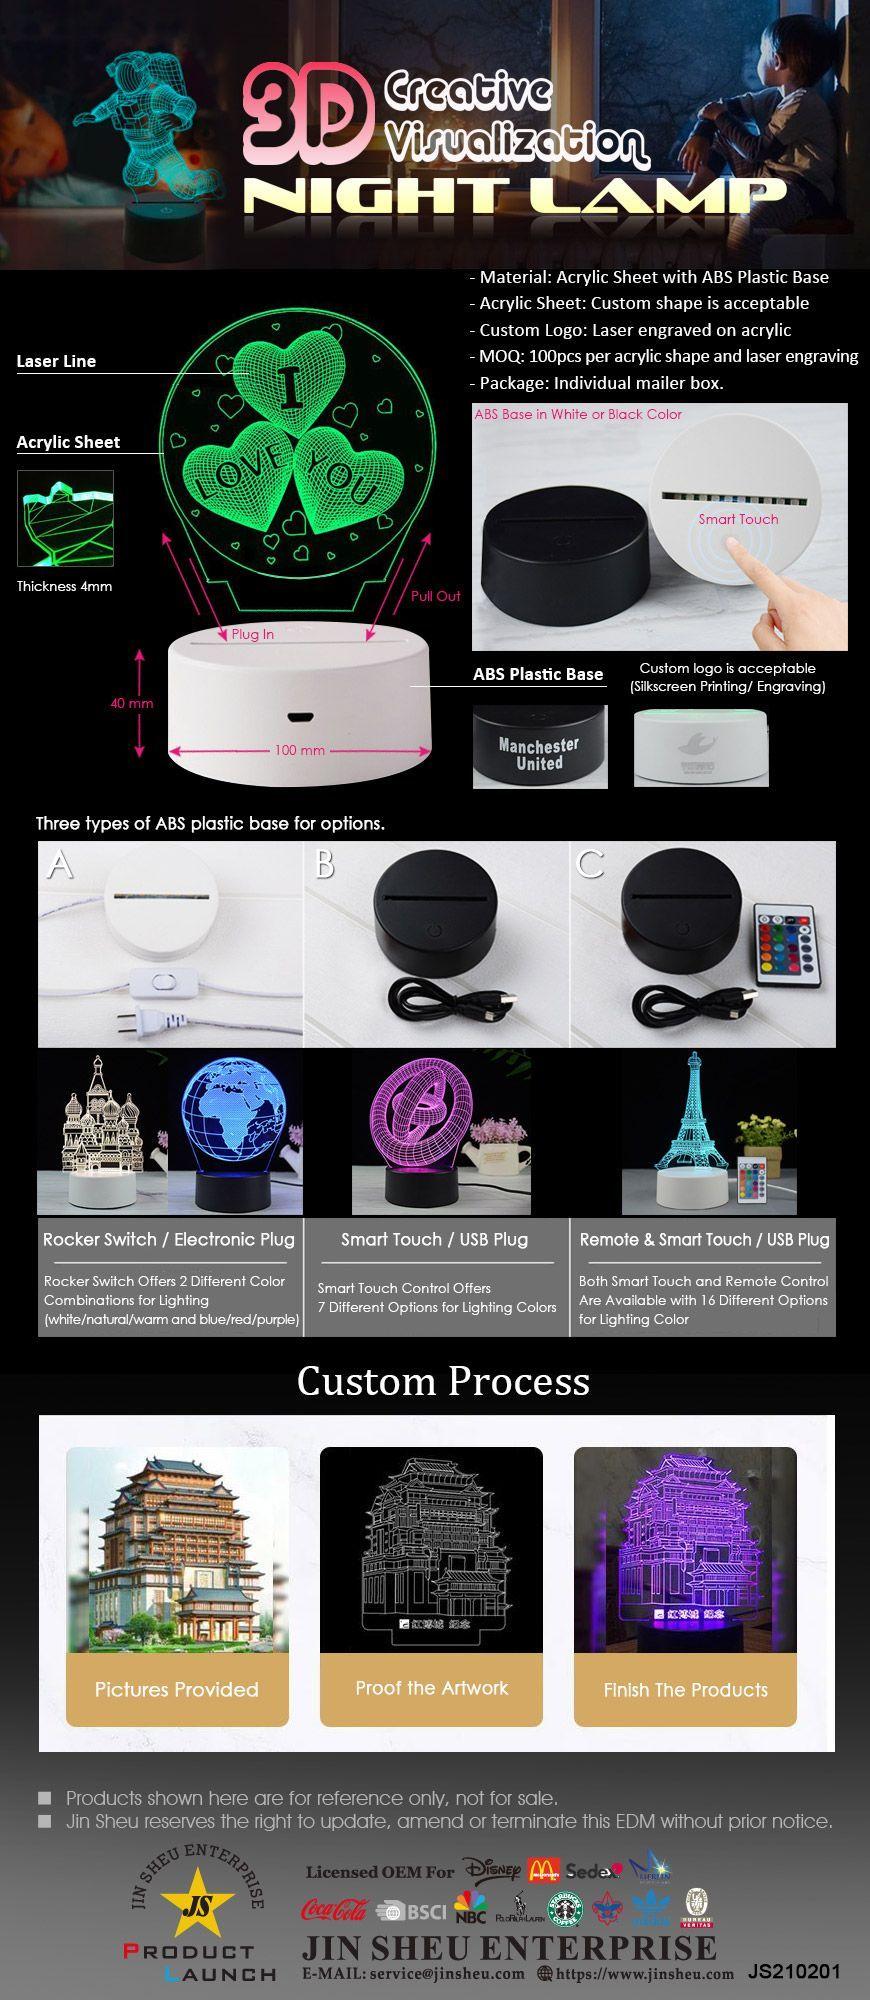 Custom Made 3D Acrylic Night Lamp